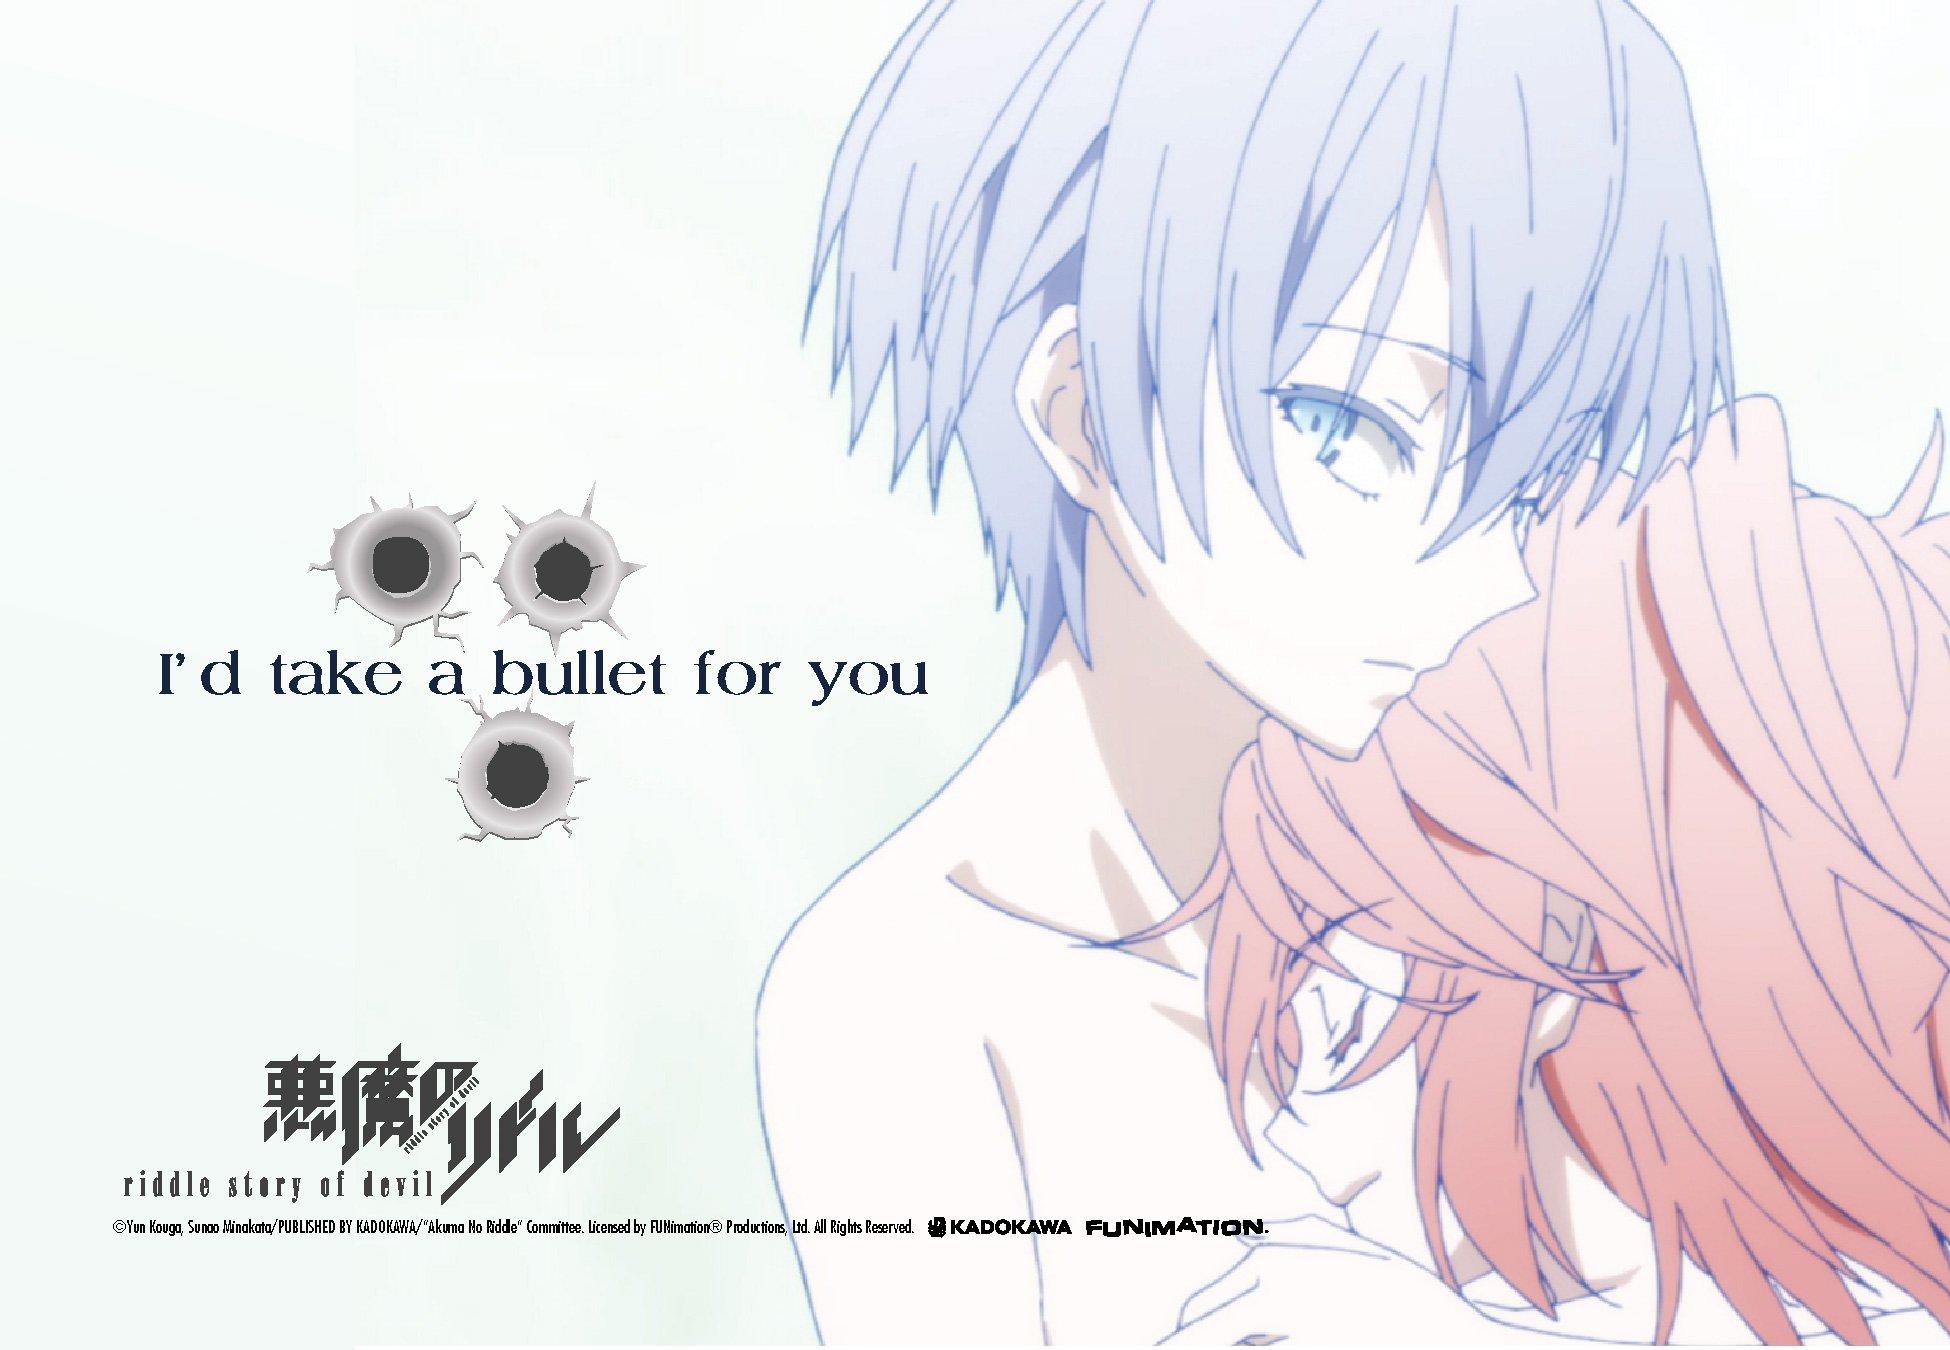 Anime Valentine's Day Cards haruhichan.com Akuma no Riddle 2